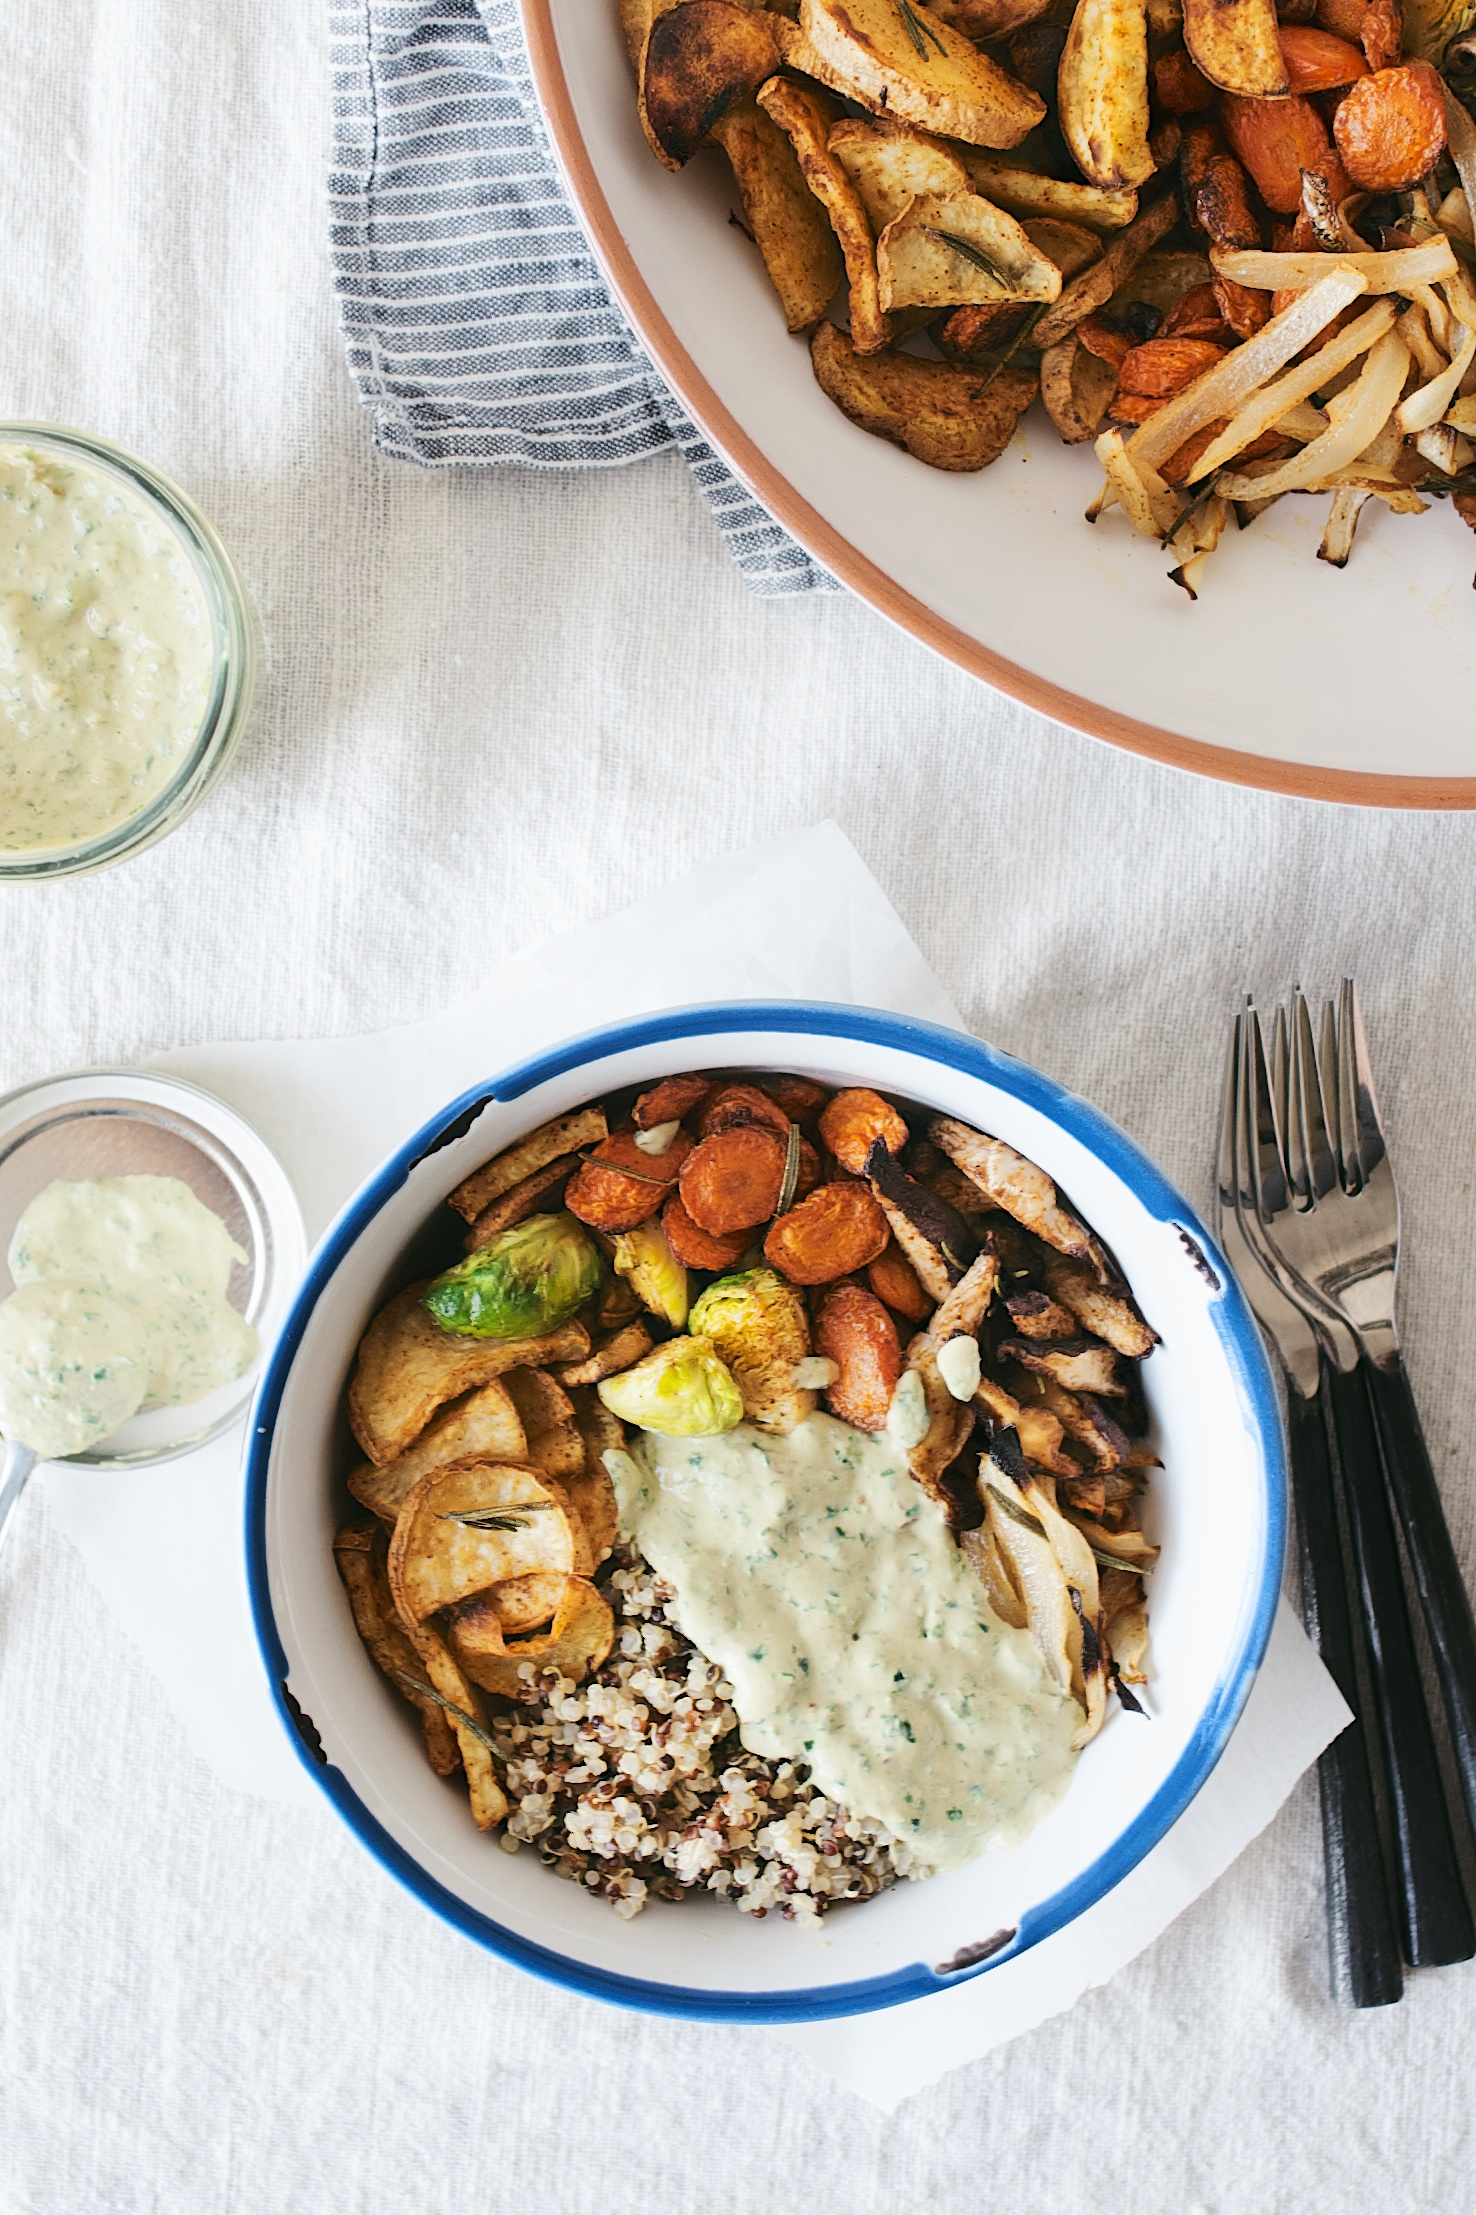 herb-roasted veggie bowl